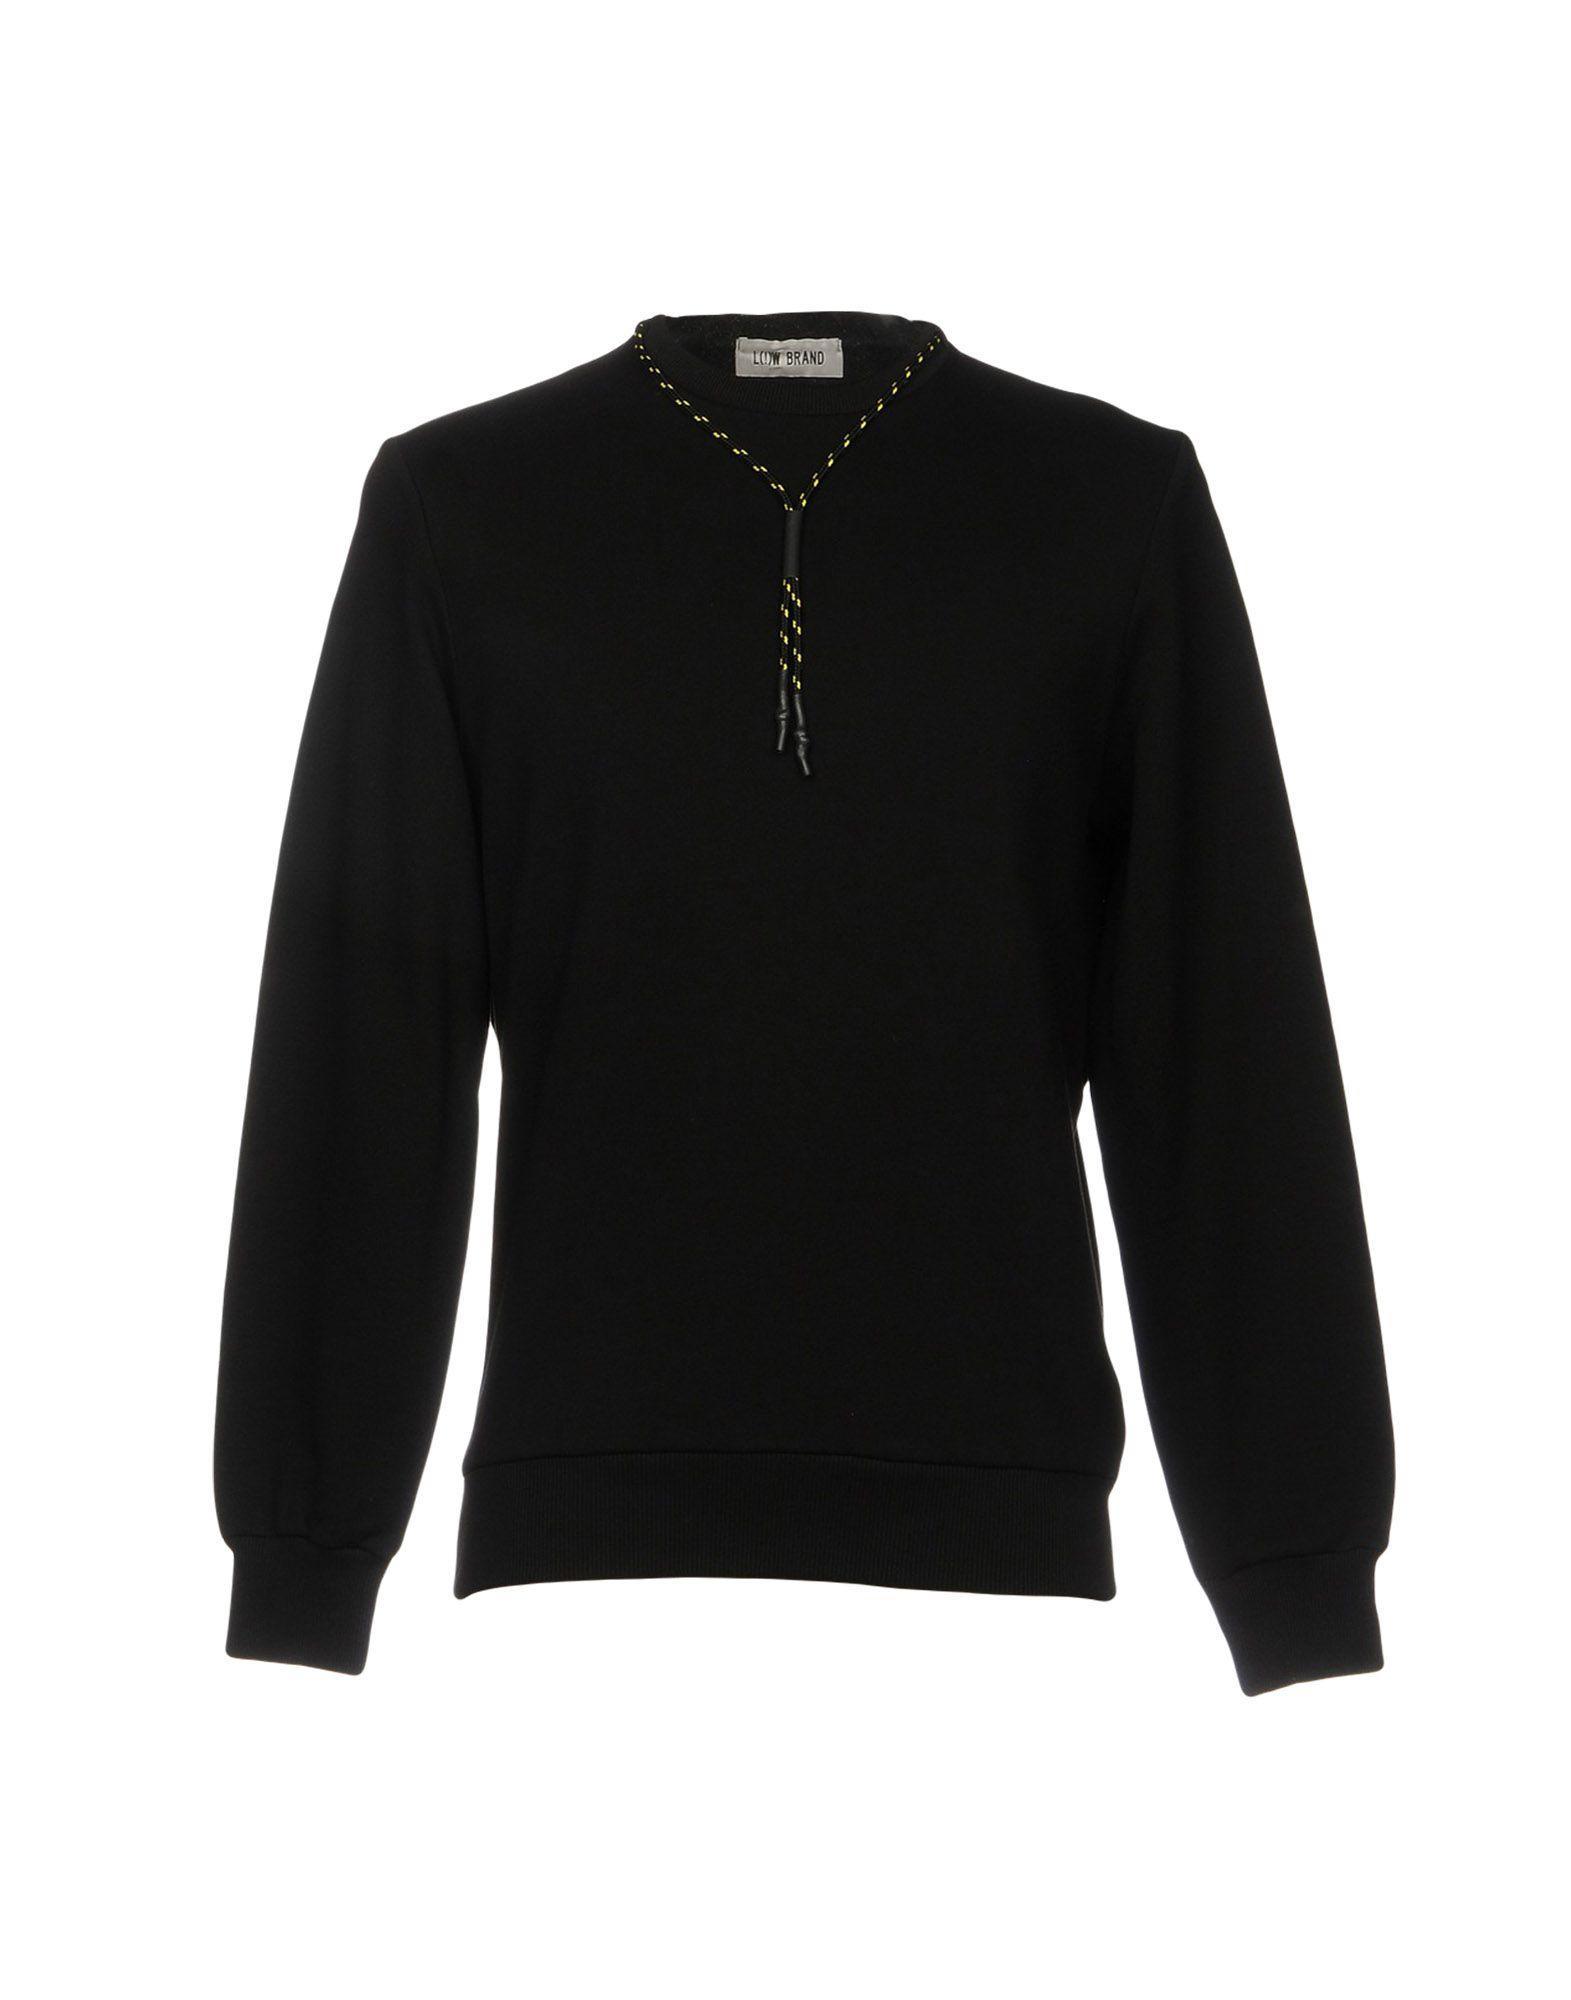 Low Brand Sweatshirt In Black